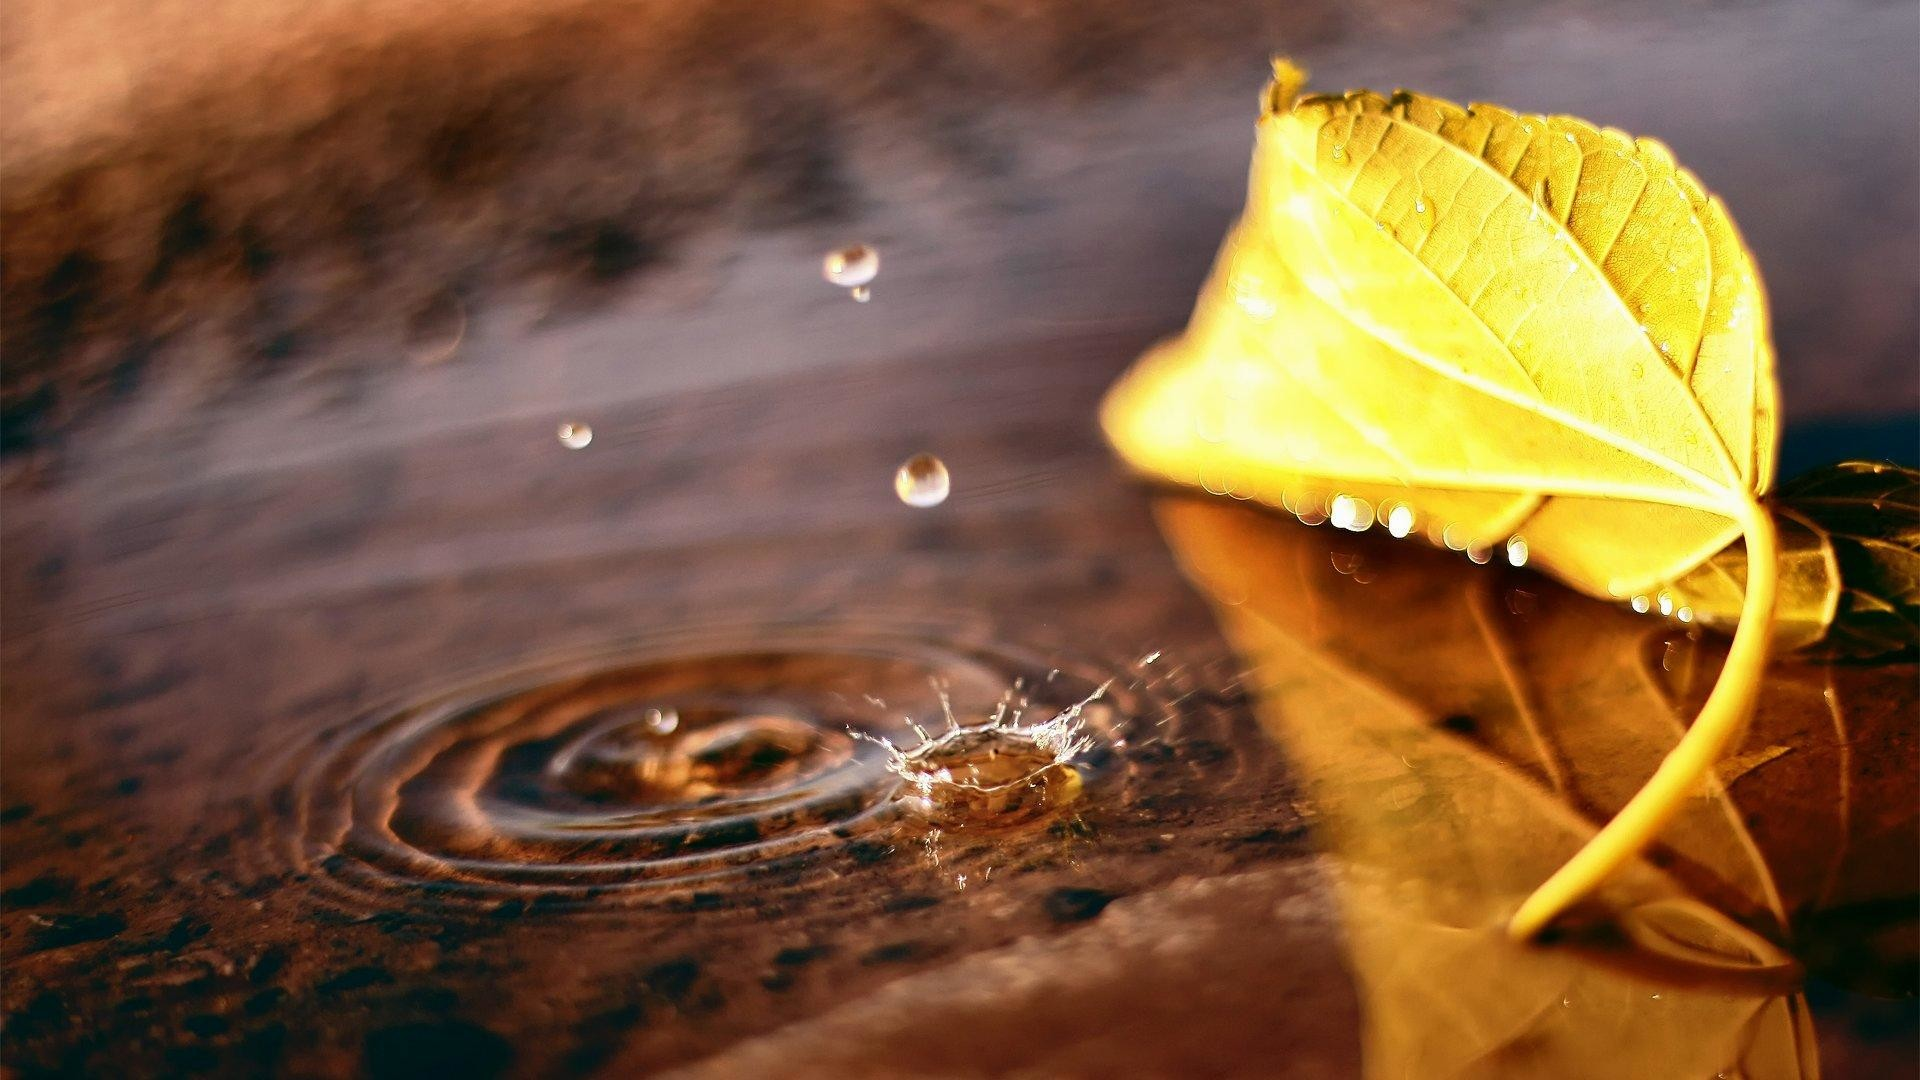 Macro-leaf-puddle-drop-fall-autumn-wallpaper